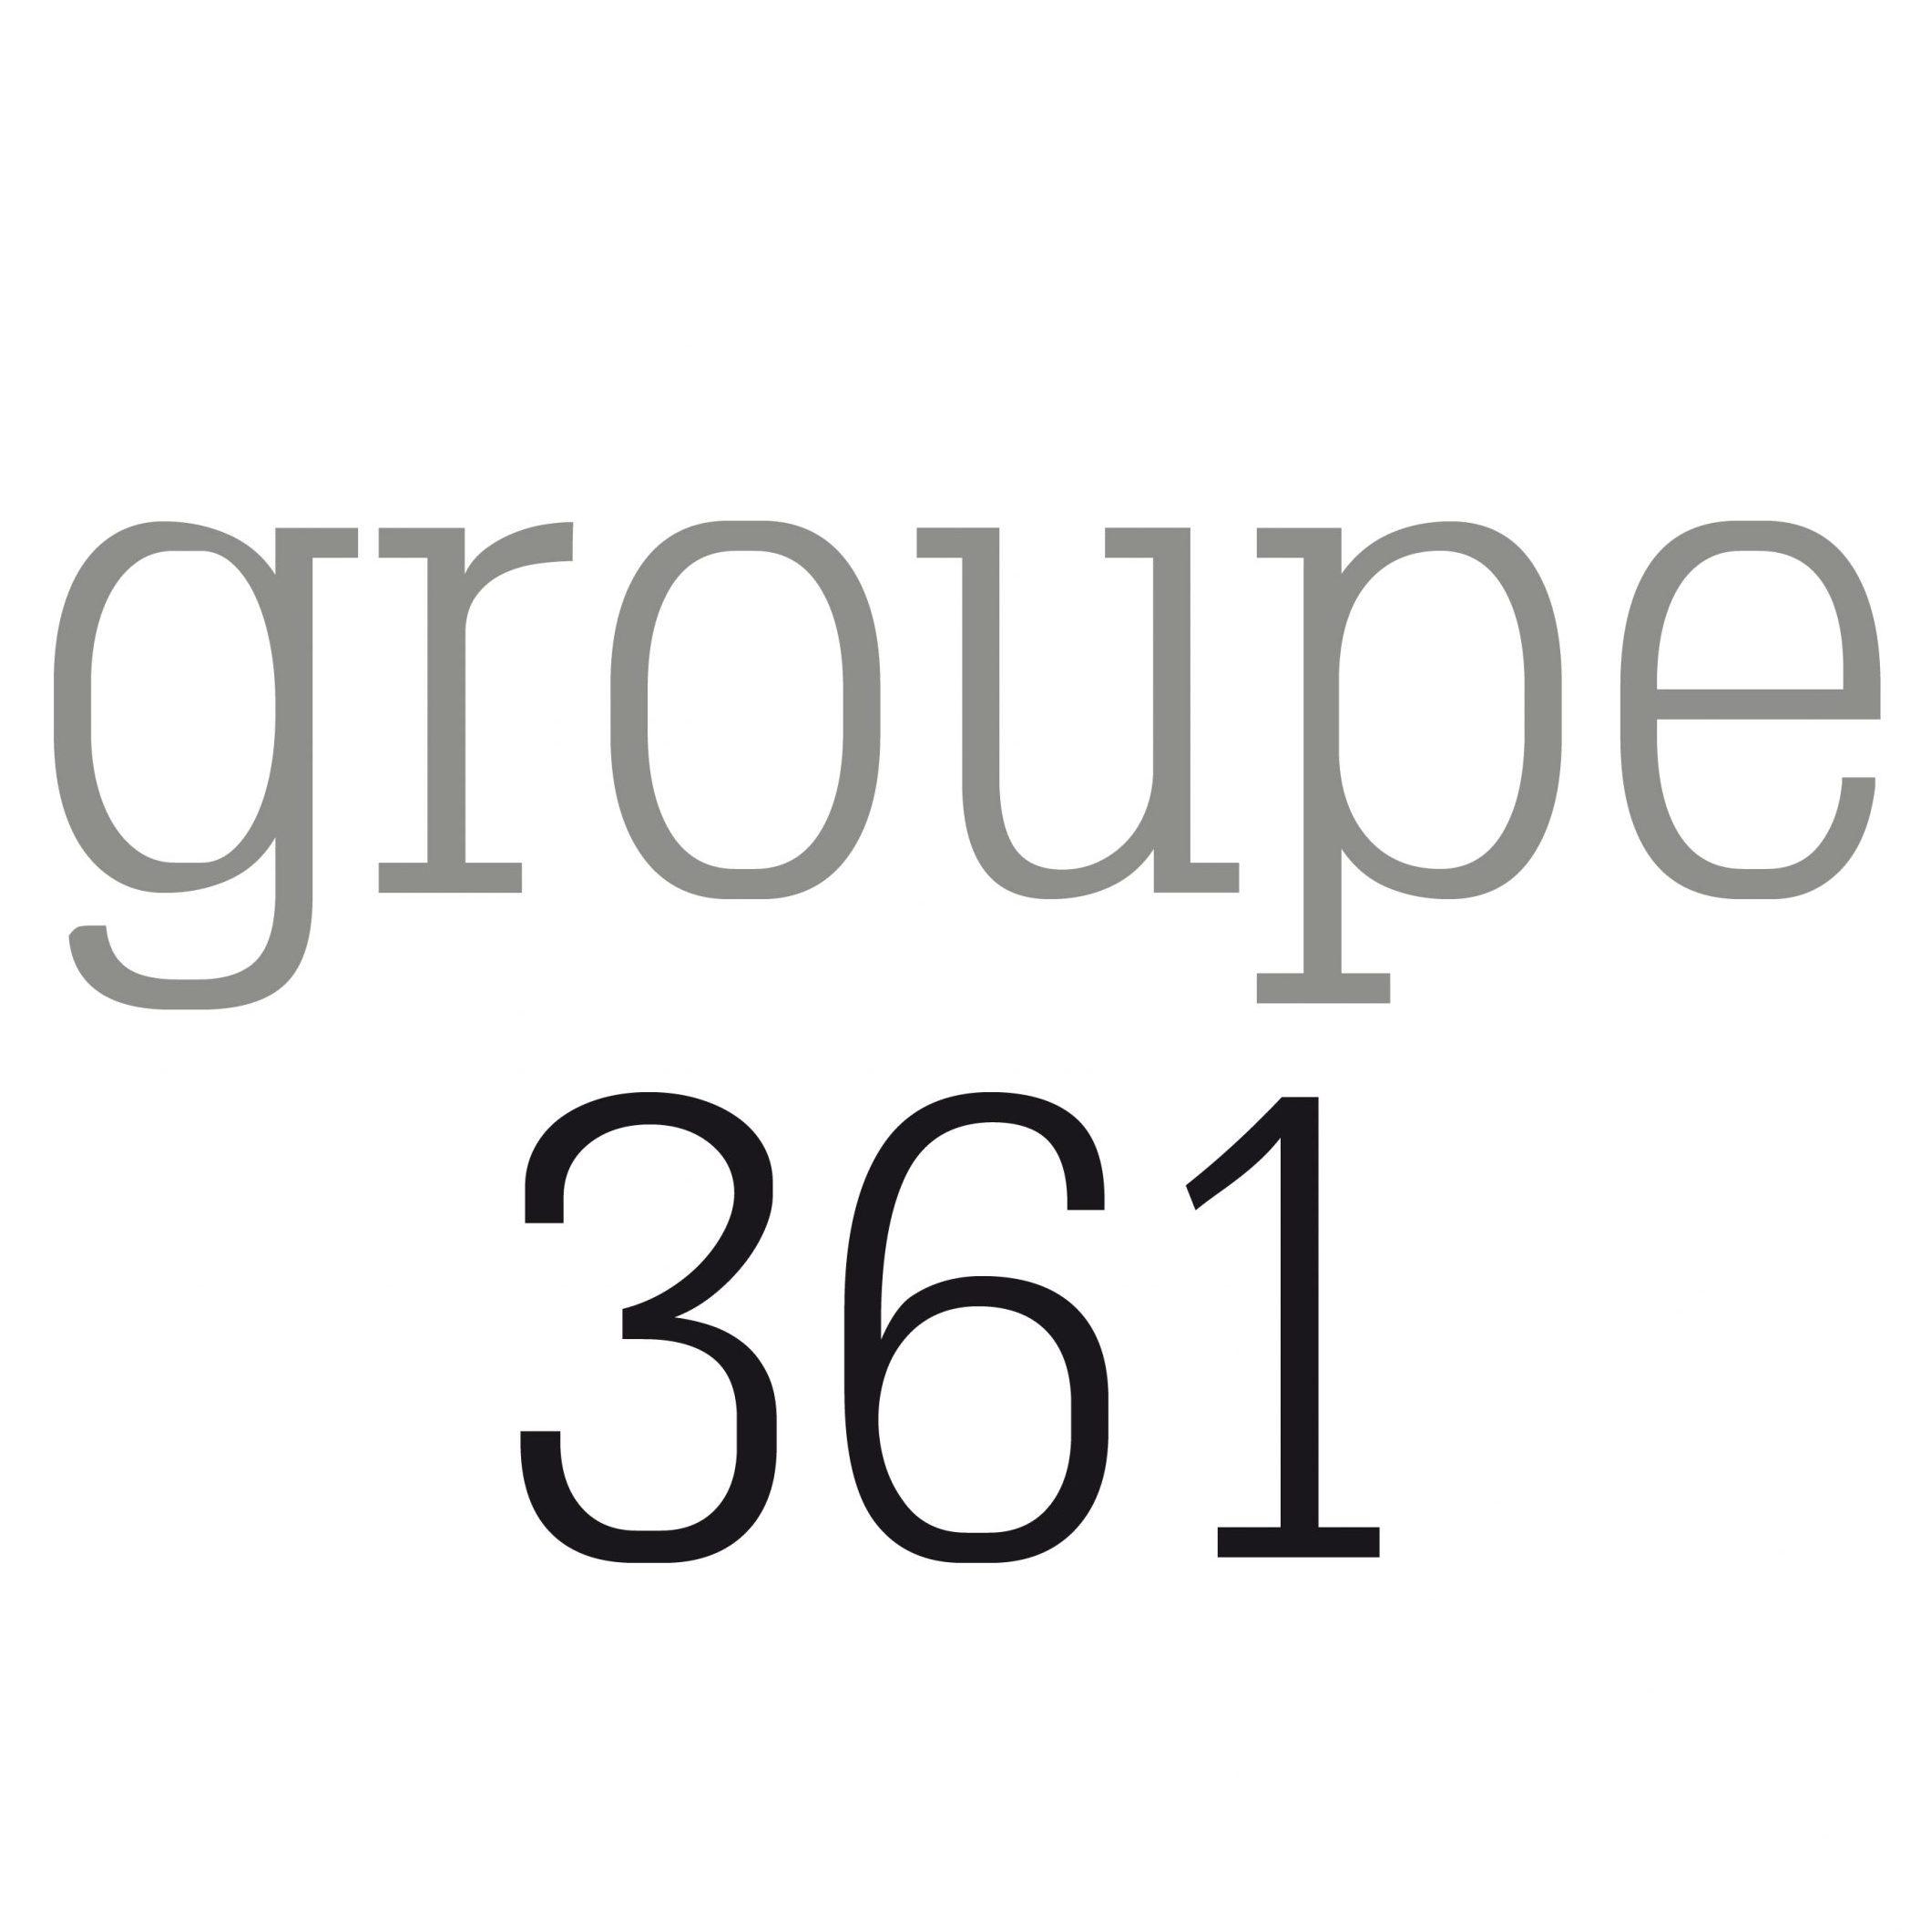 groupe361